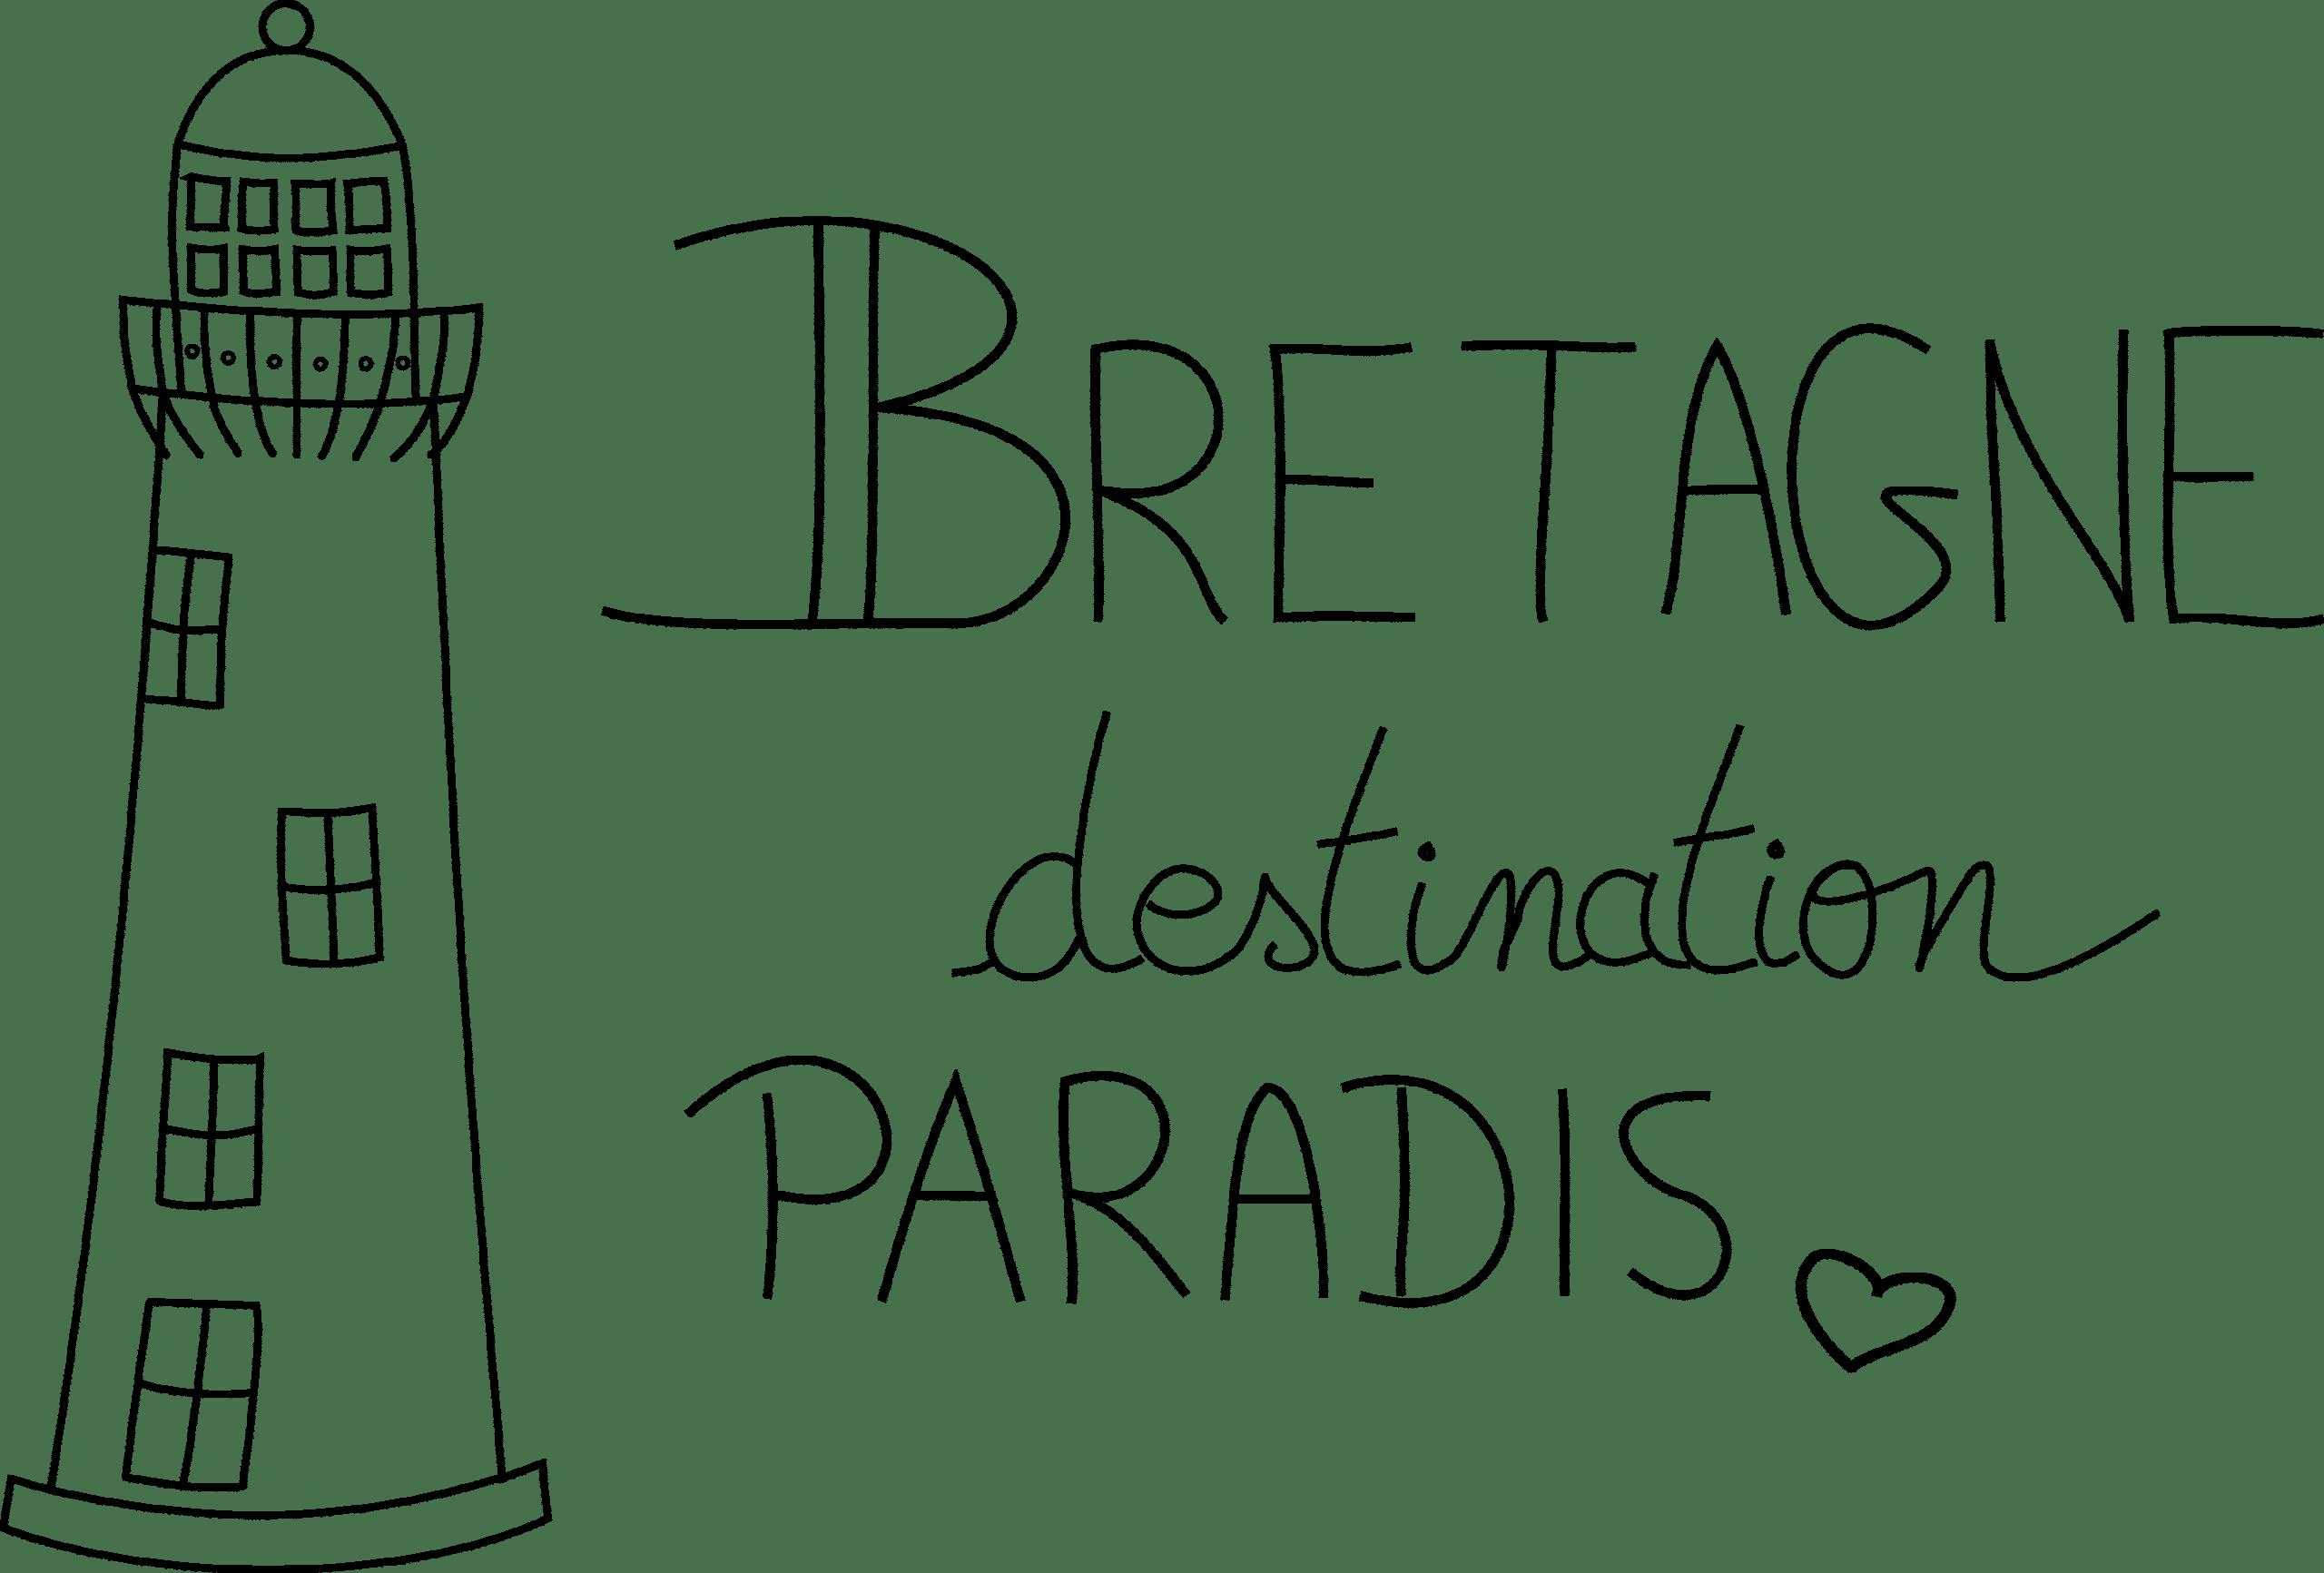 Bretagne Destination Paradis